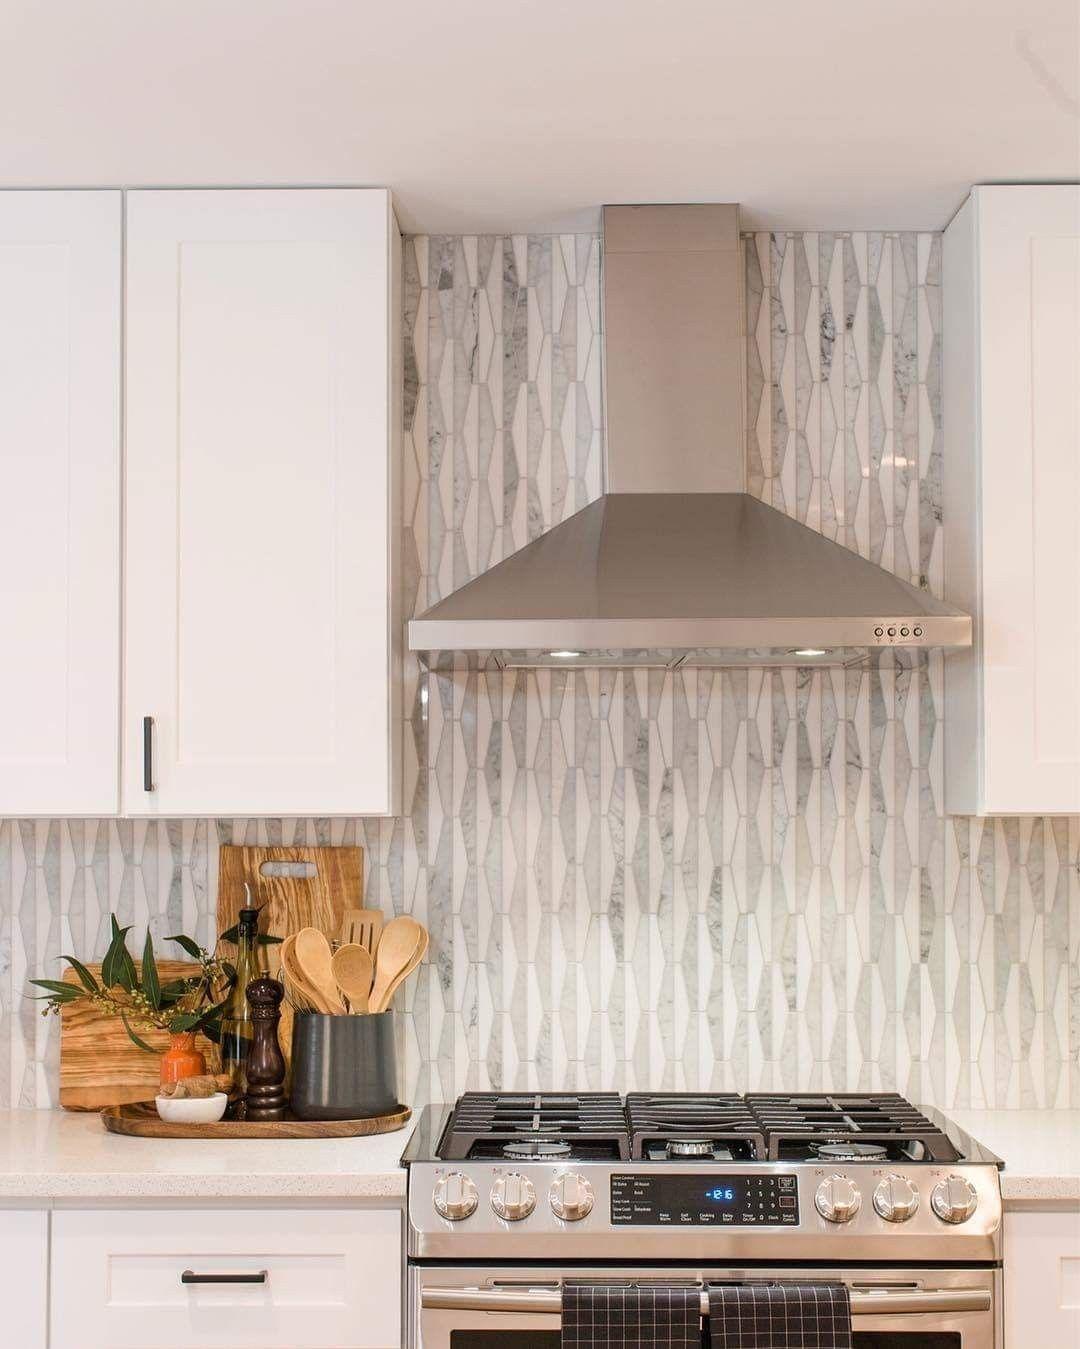 Backsplash Floor Decor Home Decor Sets Decor Floor and decor backsplash tile